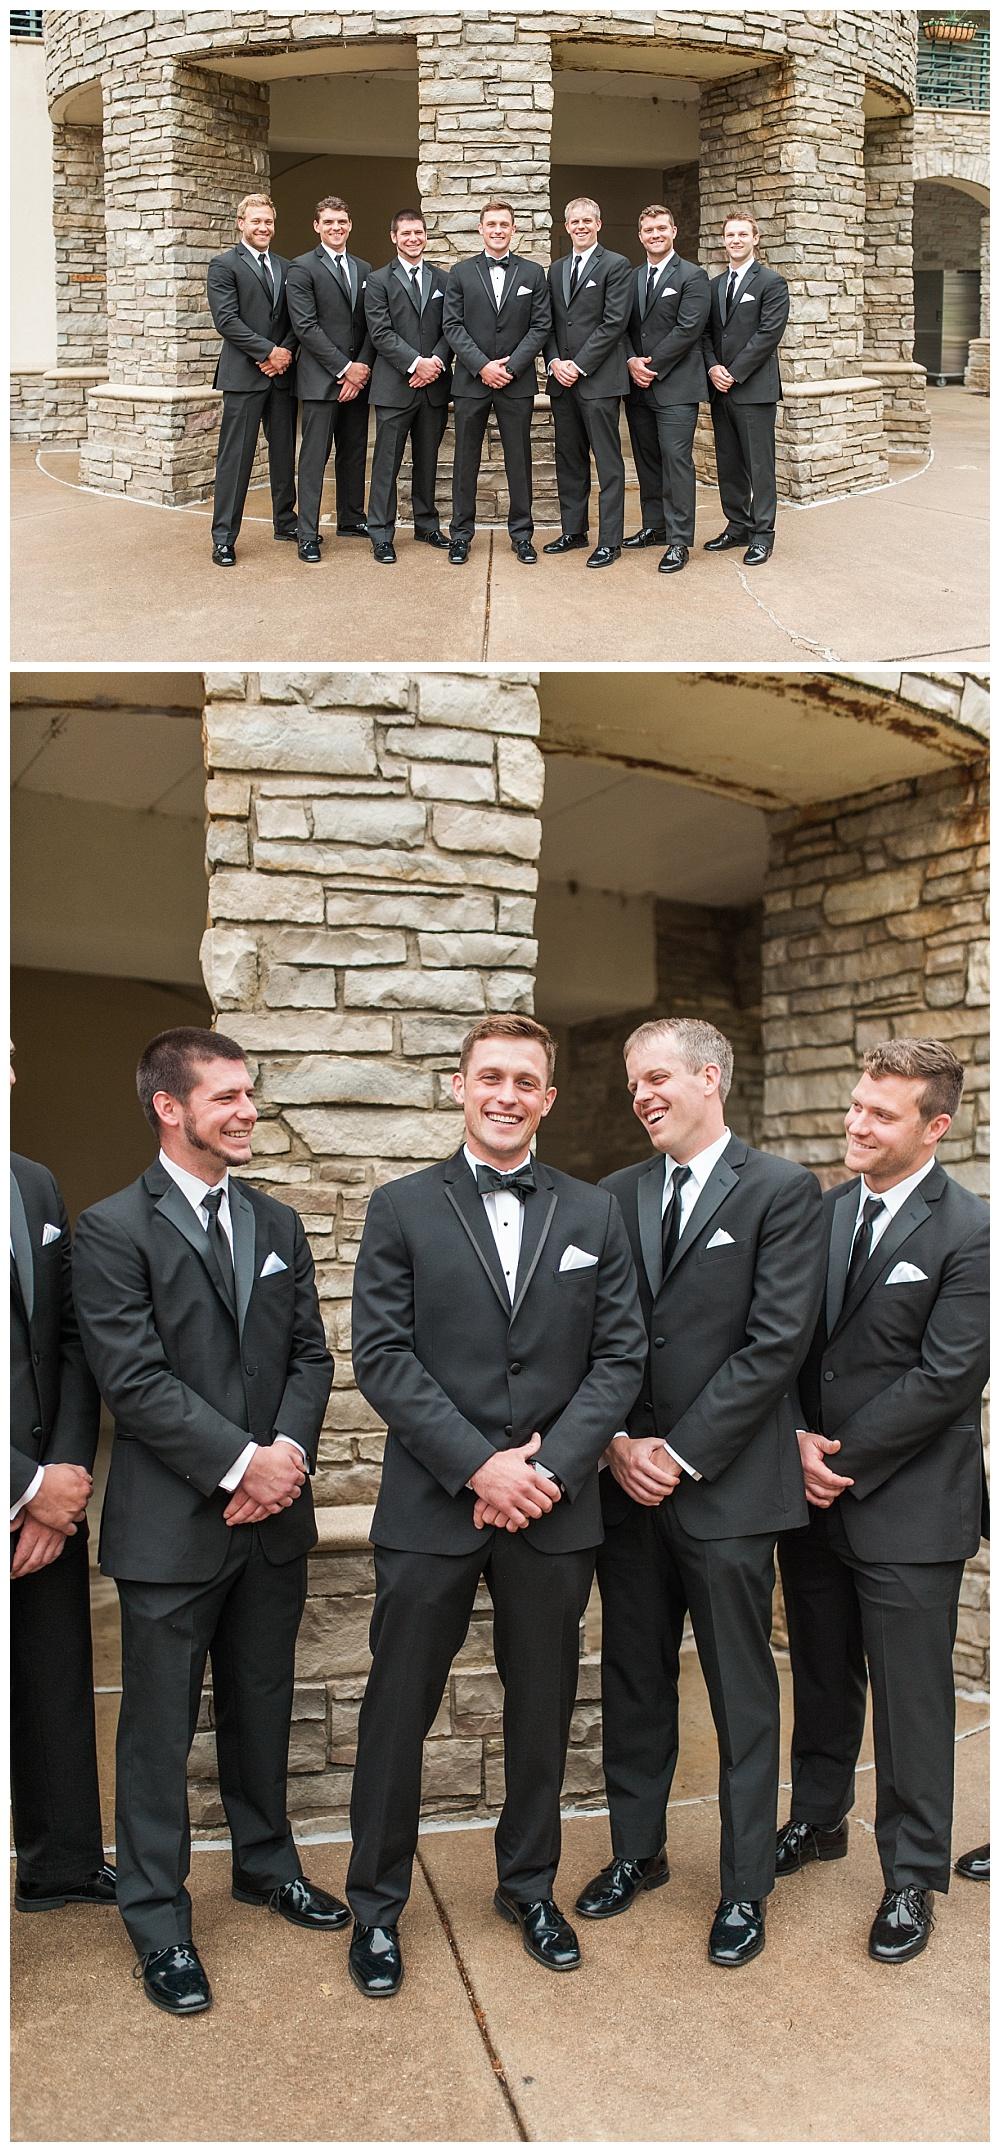 Stephanie Marie Photography TPC Deere Run Quad Cities Iowa City Wedding Photographer Ben Erin Dittmer_0035.jpg